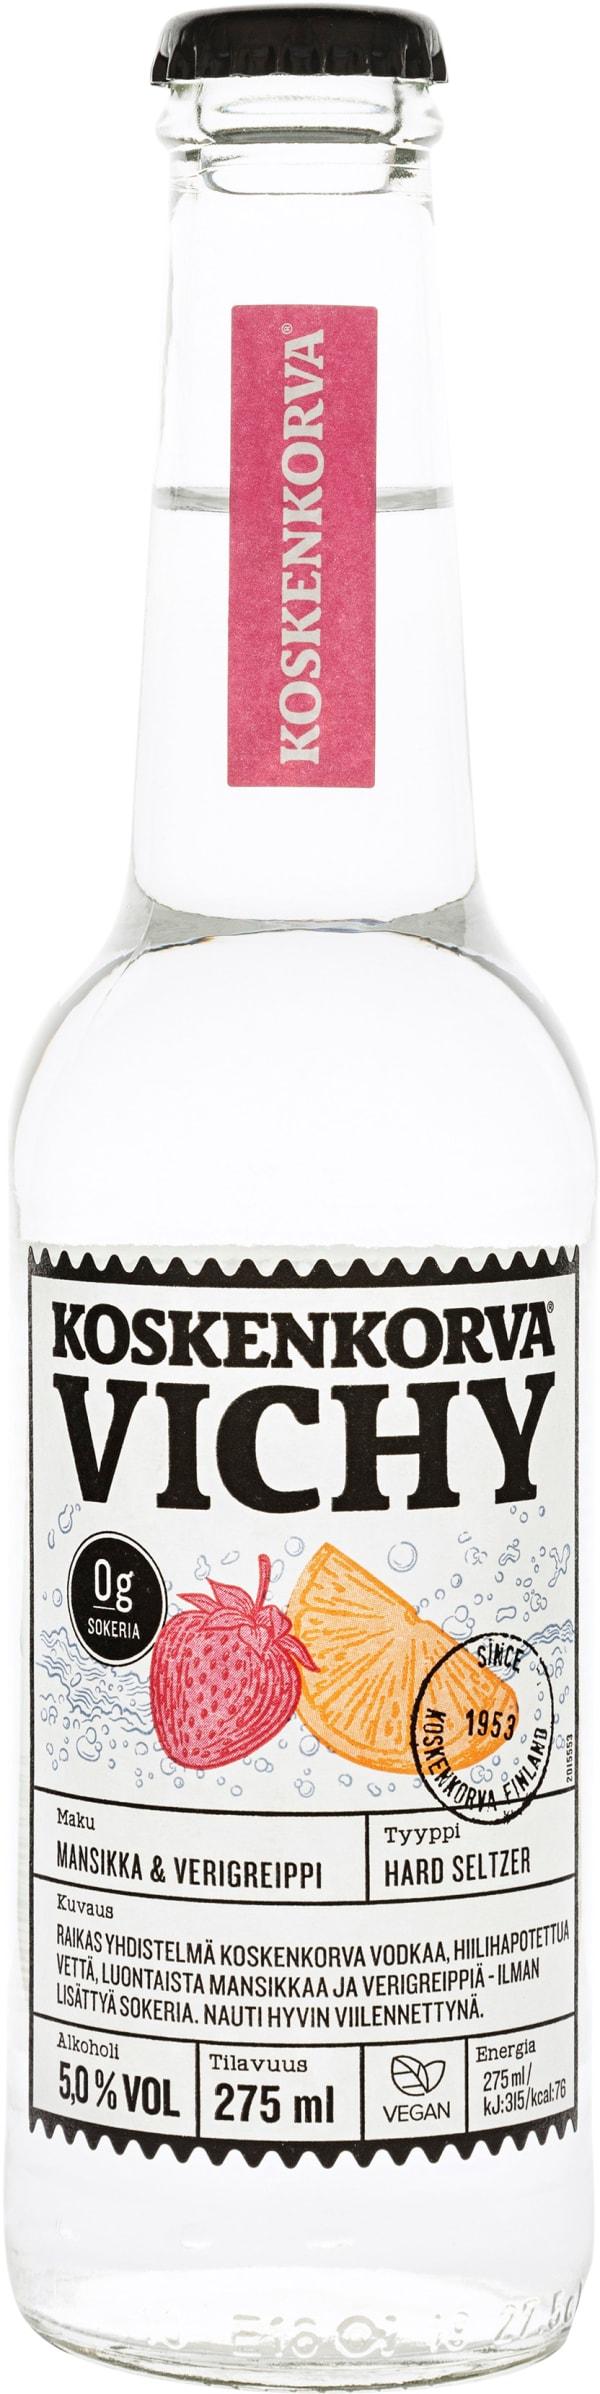 Koskenkorva Vichy Hard Seltzer Mansikka Verigreippi